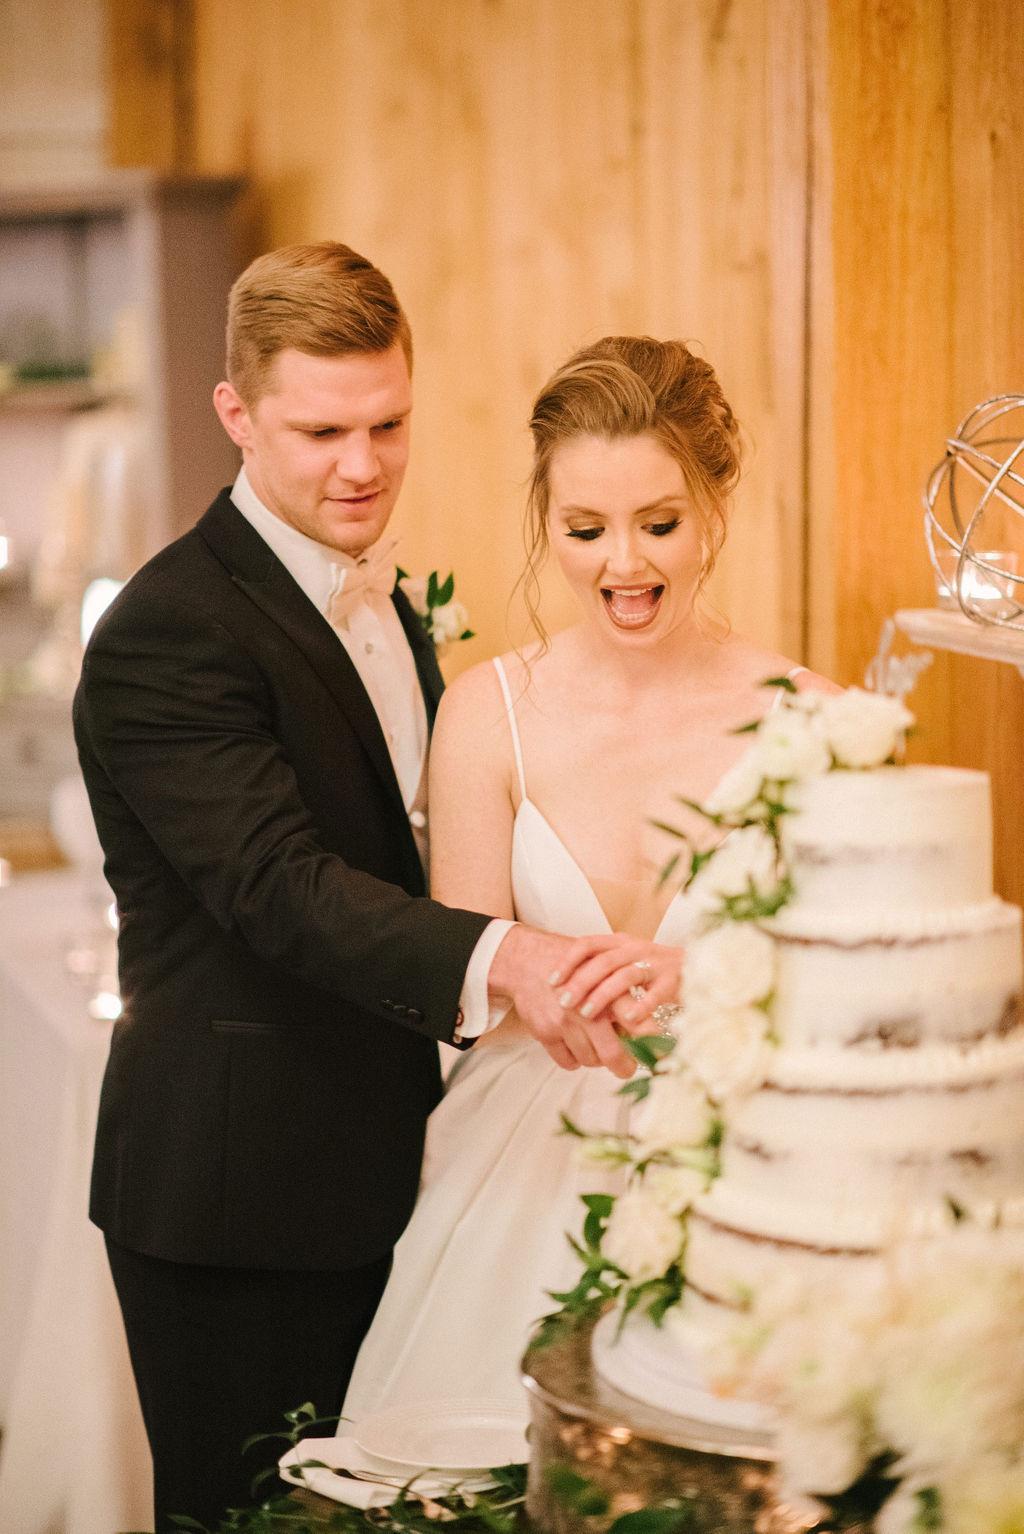 brielle-davis-events-shadow-creek-wedding-annie-david-cake-cutting.jpg